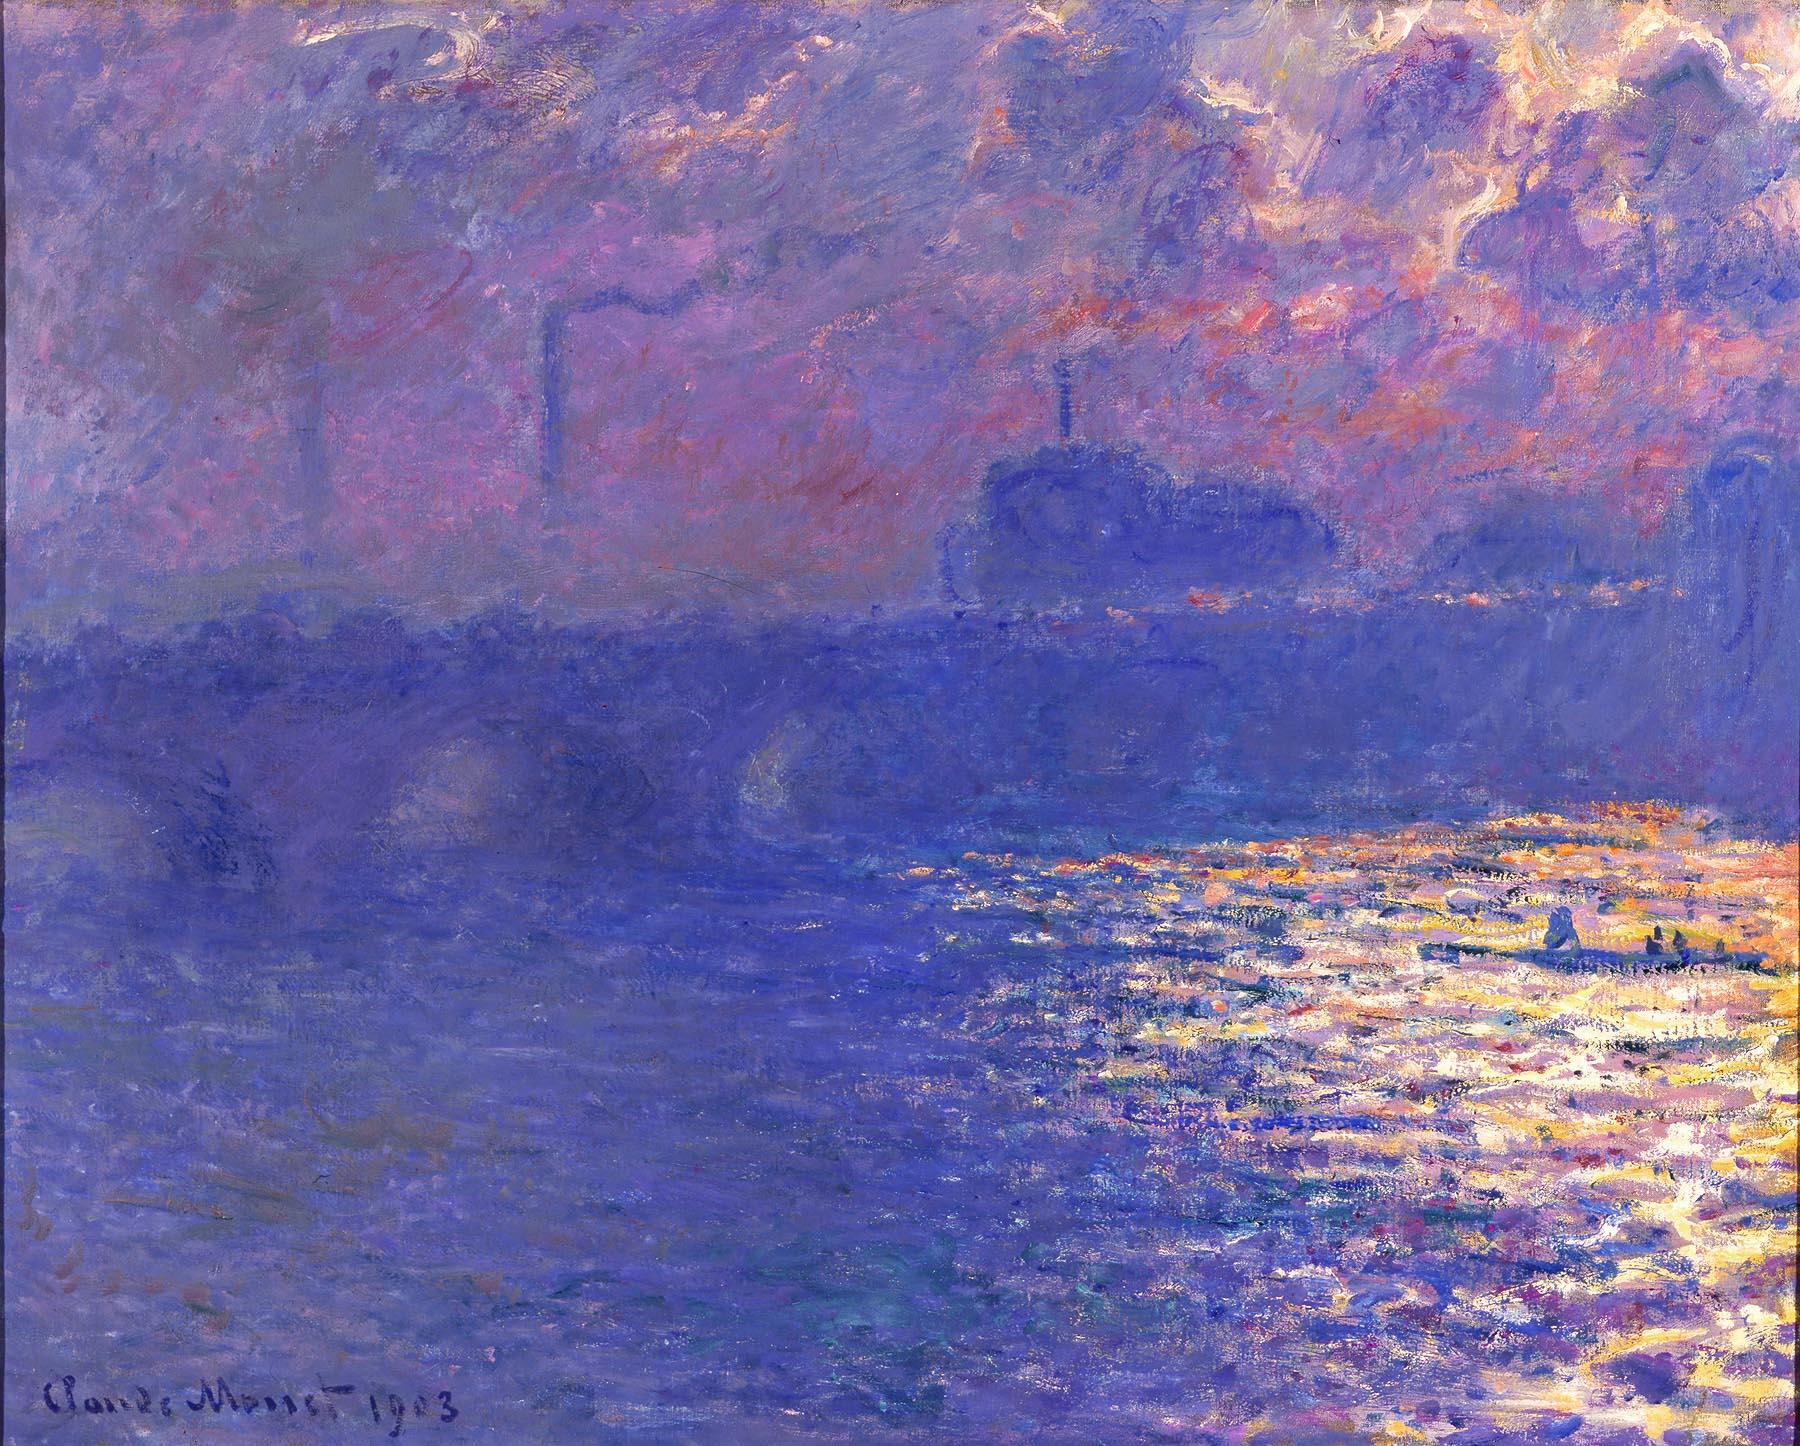 Claude Monet (French, 1840–1926). Waterloo Bridge, Sunlight Effect, ca. 1900 (dated 1903). Oil on canvas. Milwaukee Art Museum, Bequest of Mrs. Albert T. Friedmann M1950.3. Photo credit: John R. Glembin.